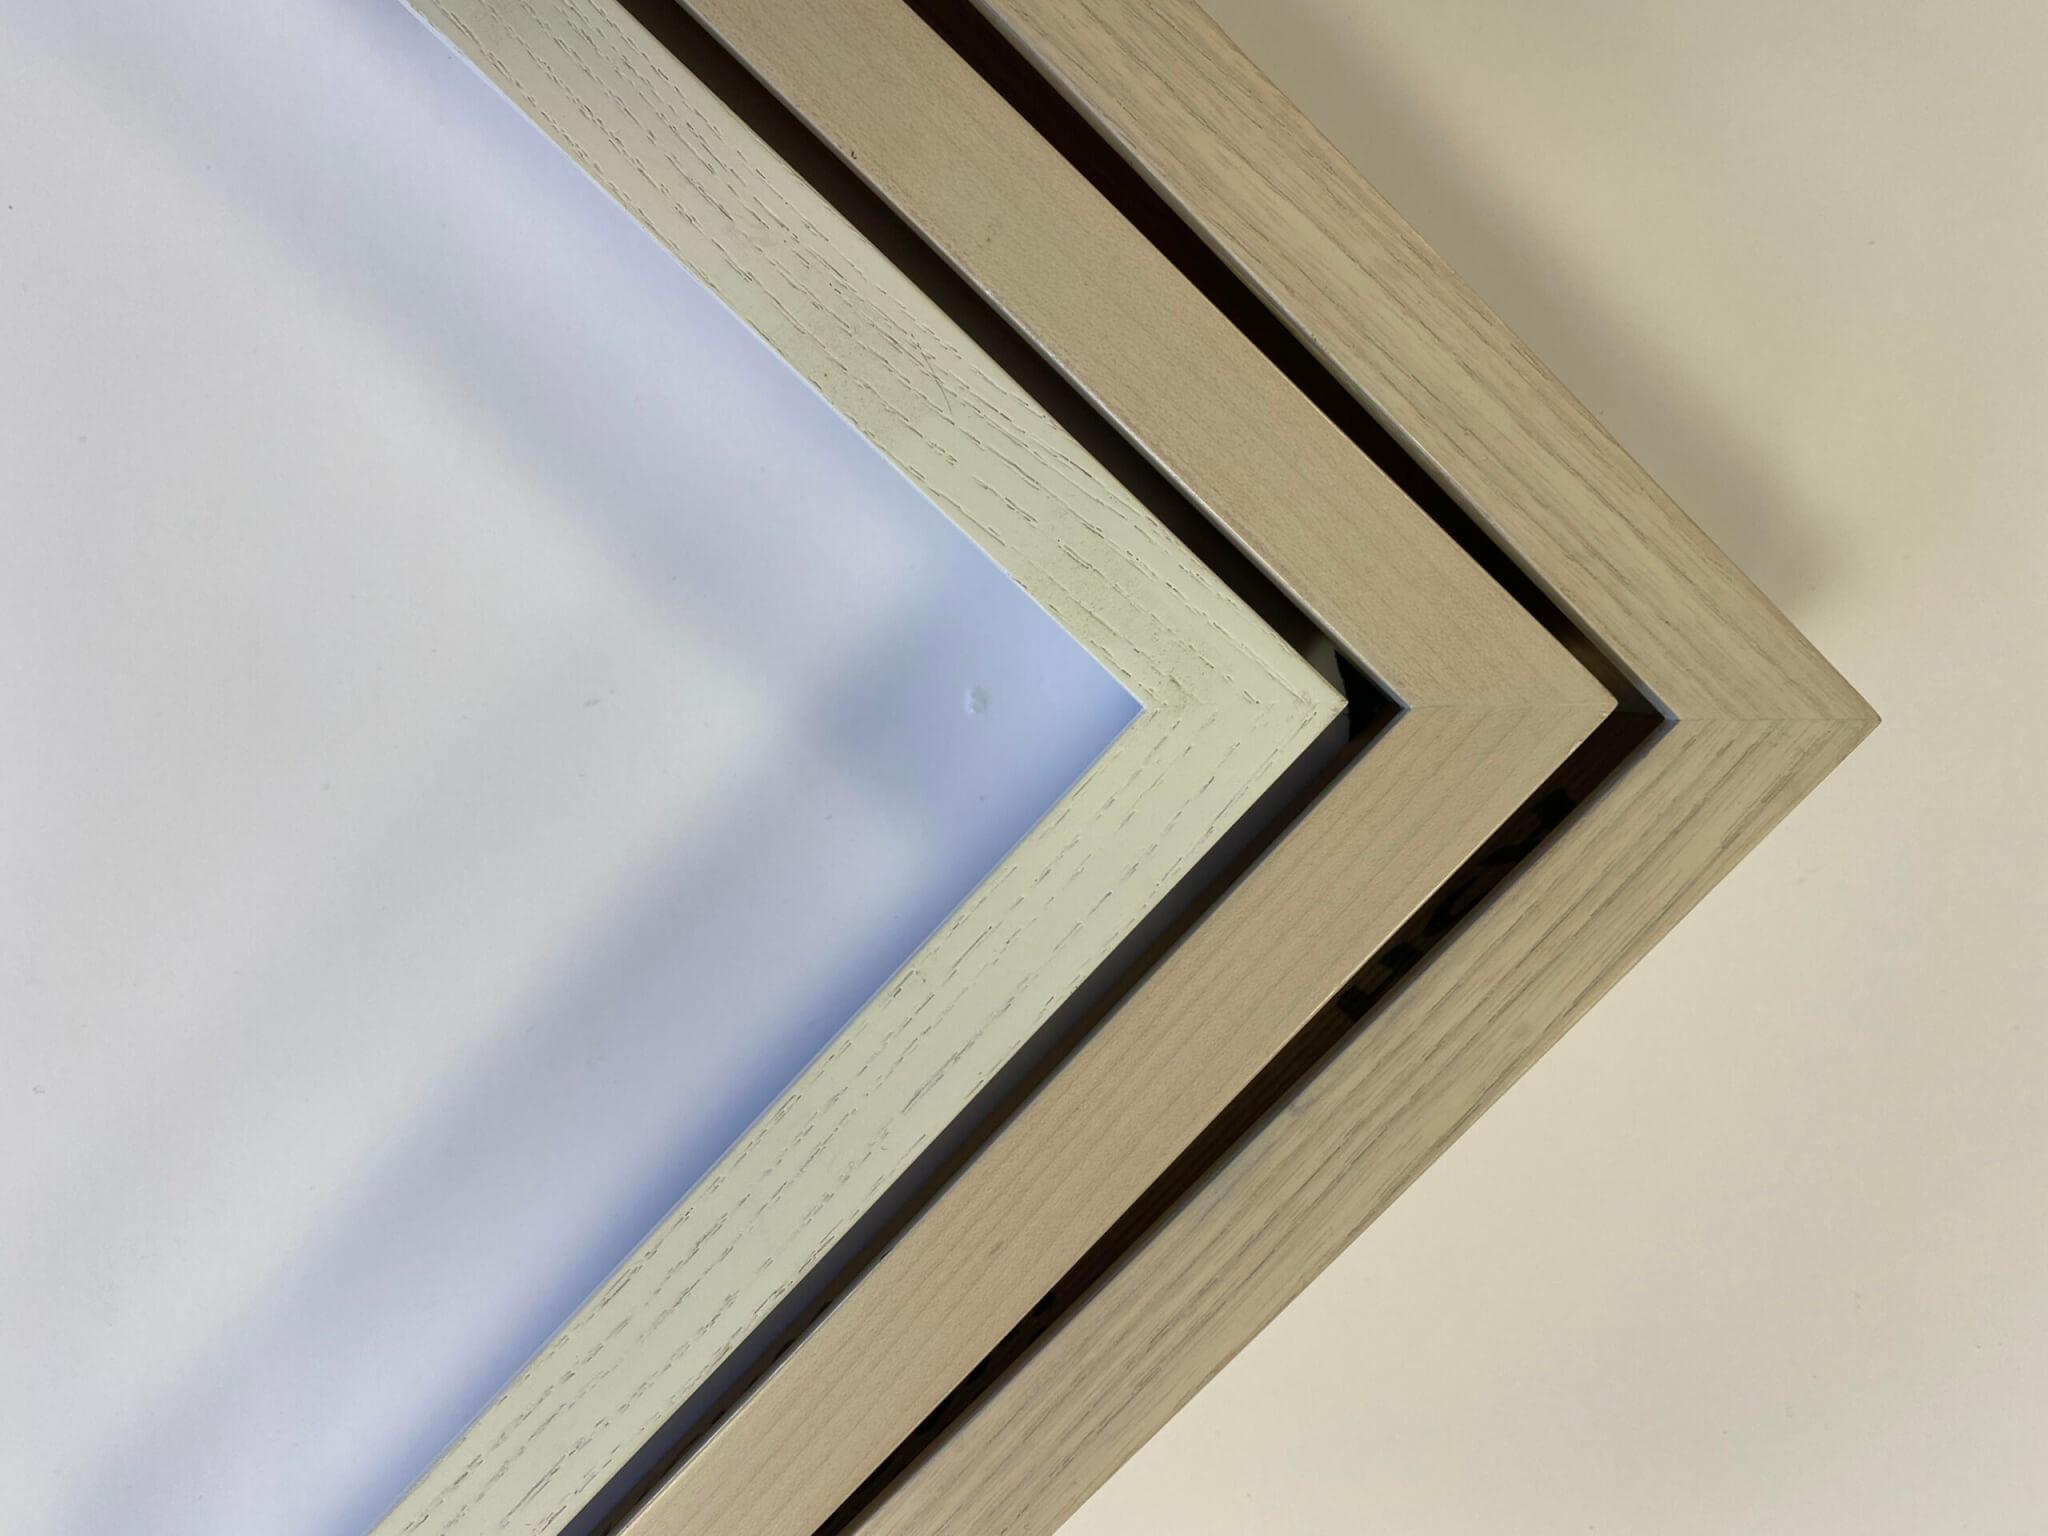 custom white finished picture frames, custom pickled finish frames, white wash maple custom frames chicago